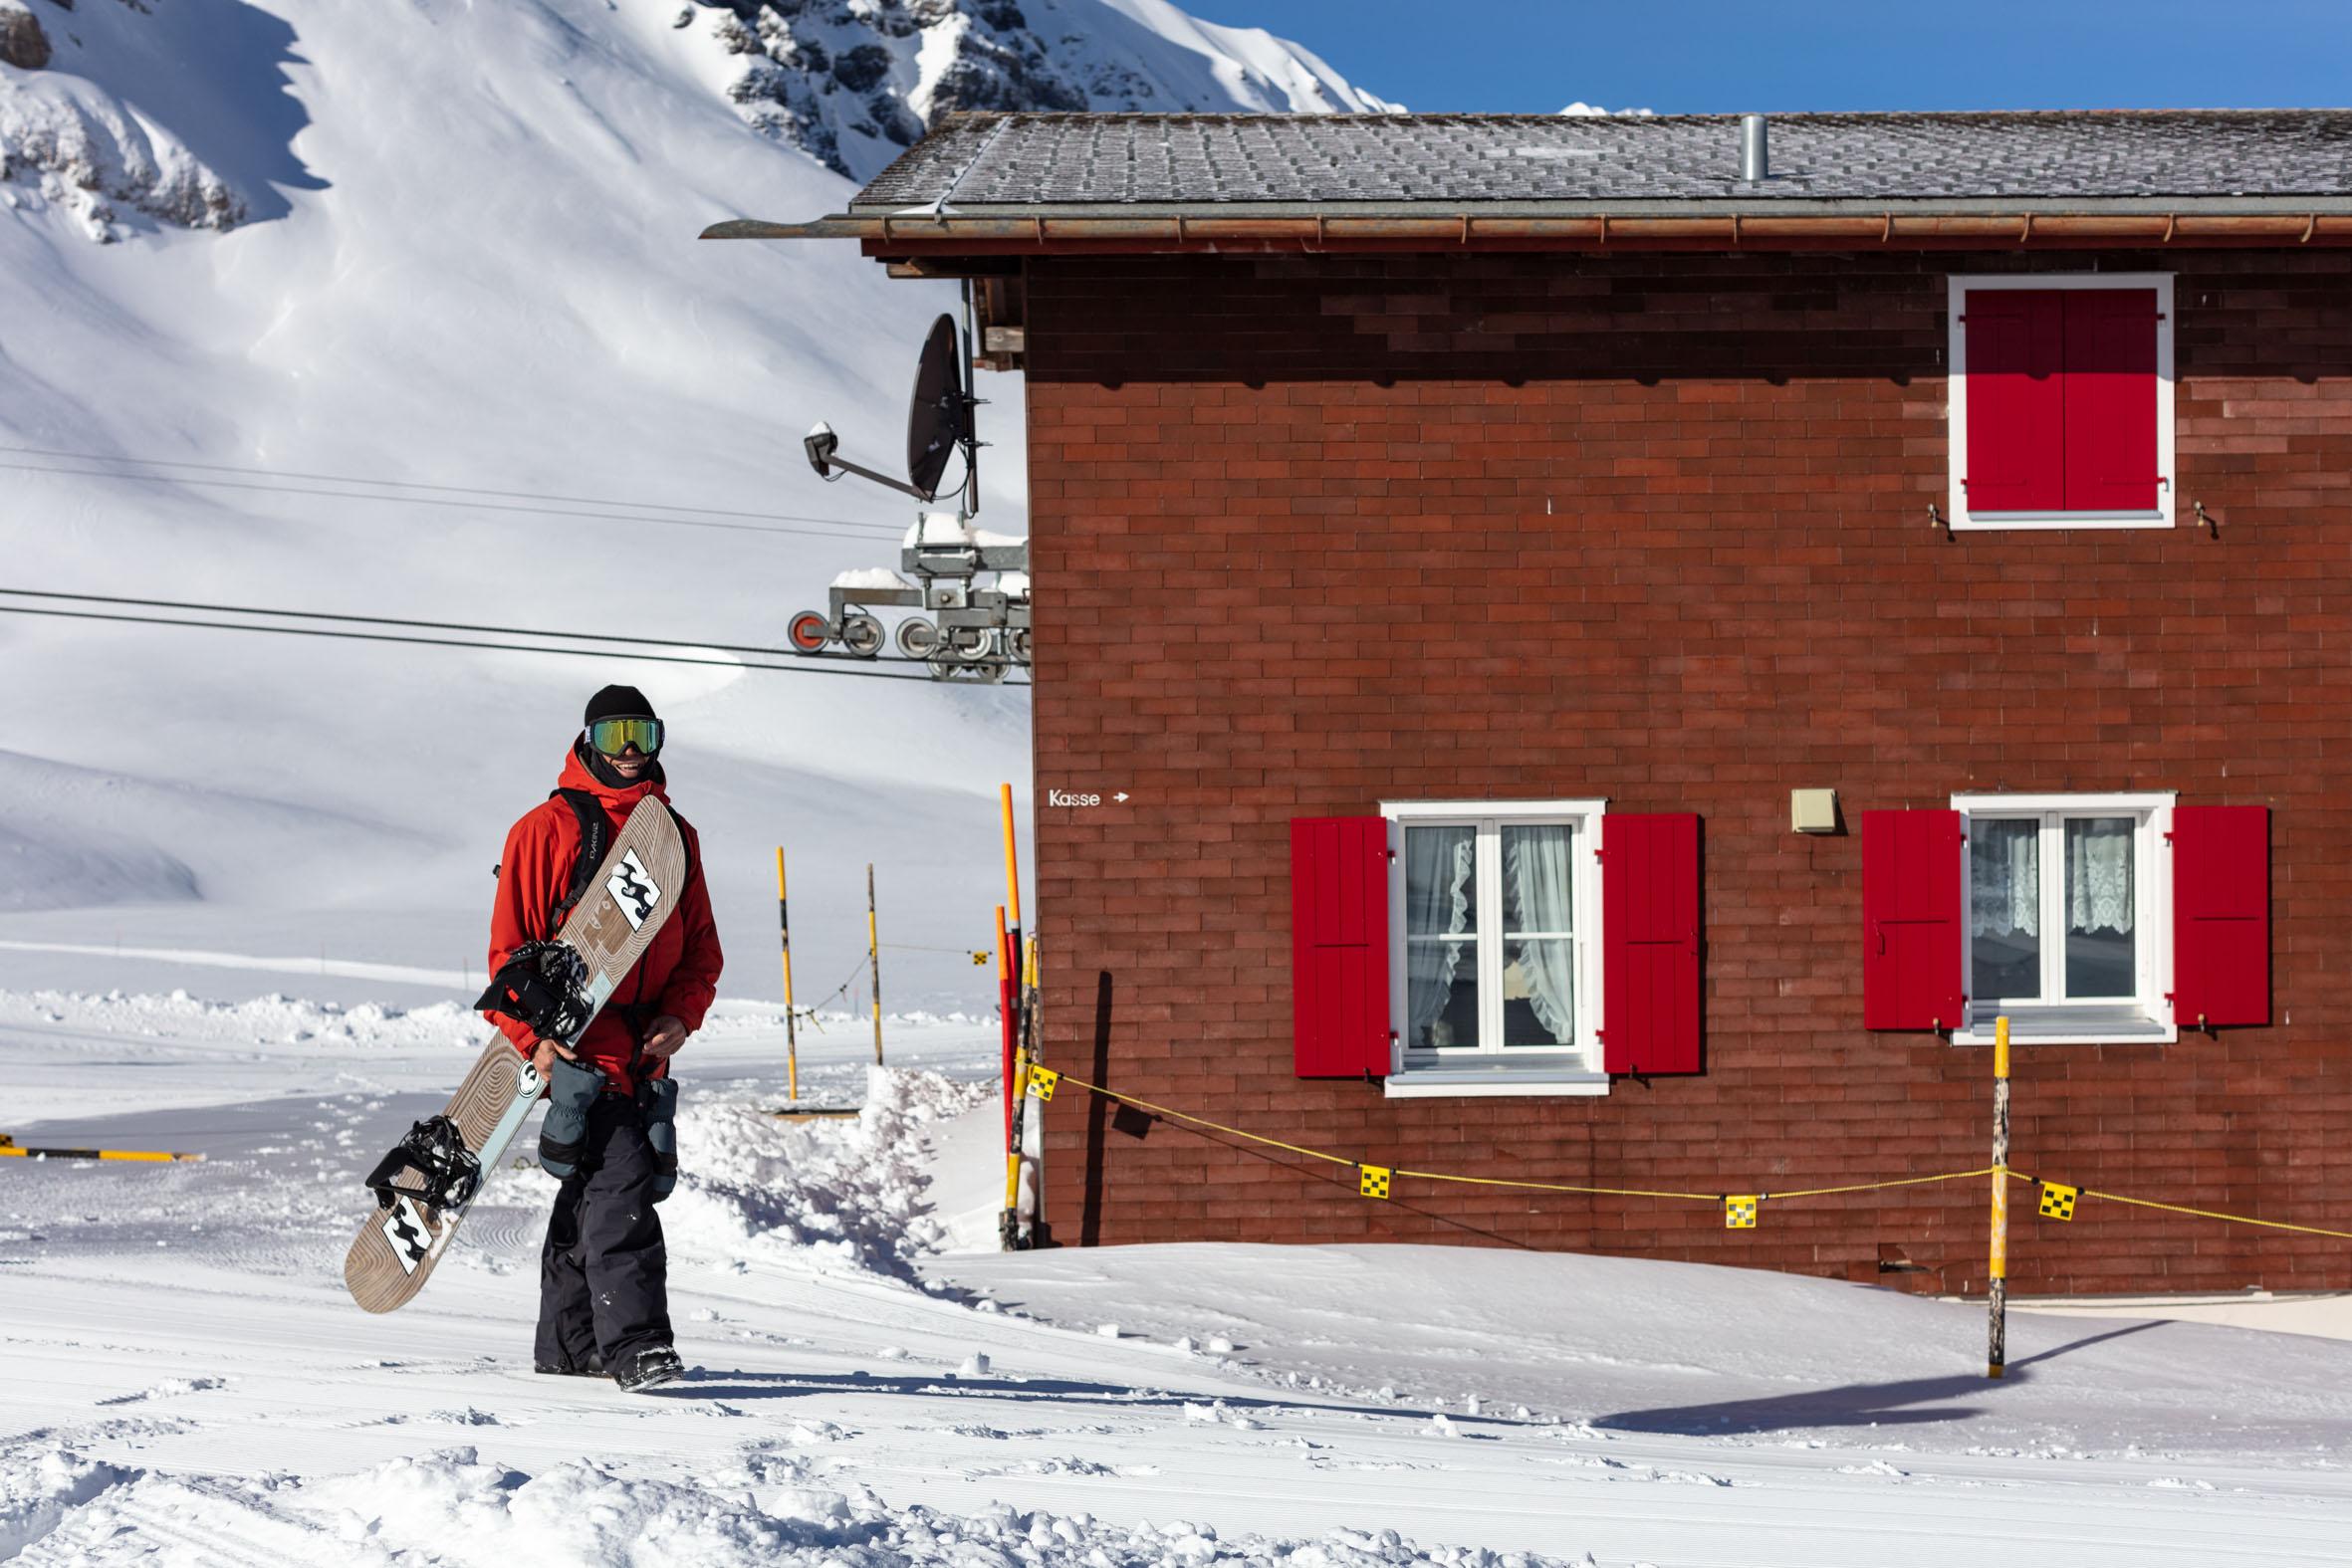 Absinthe Films Isle of Snow